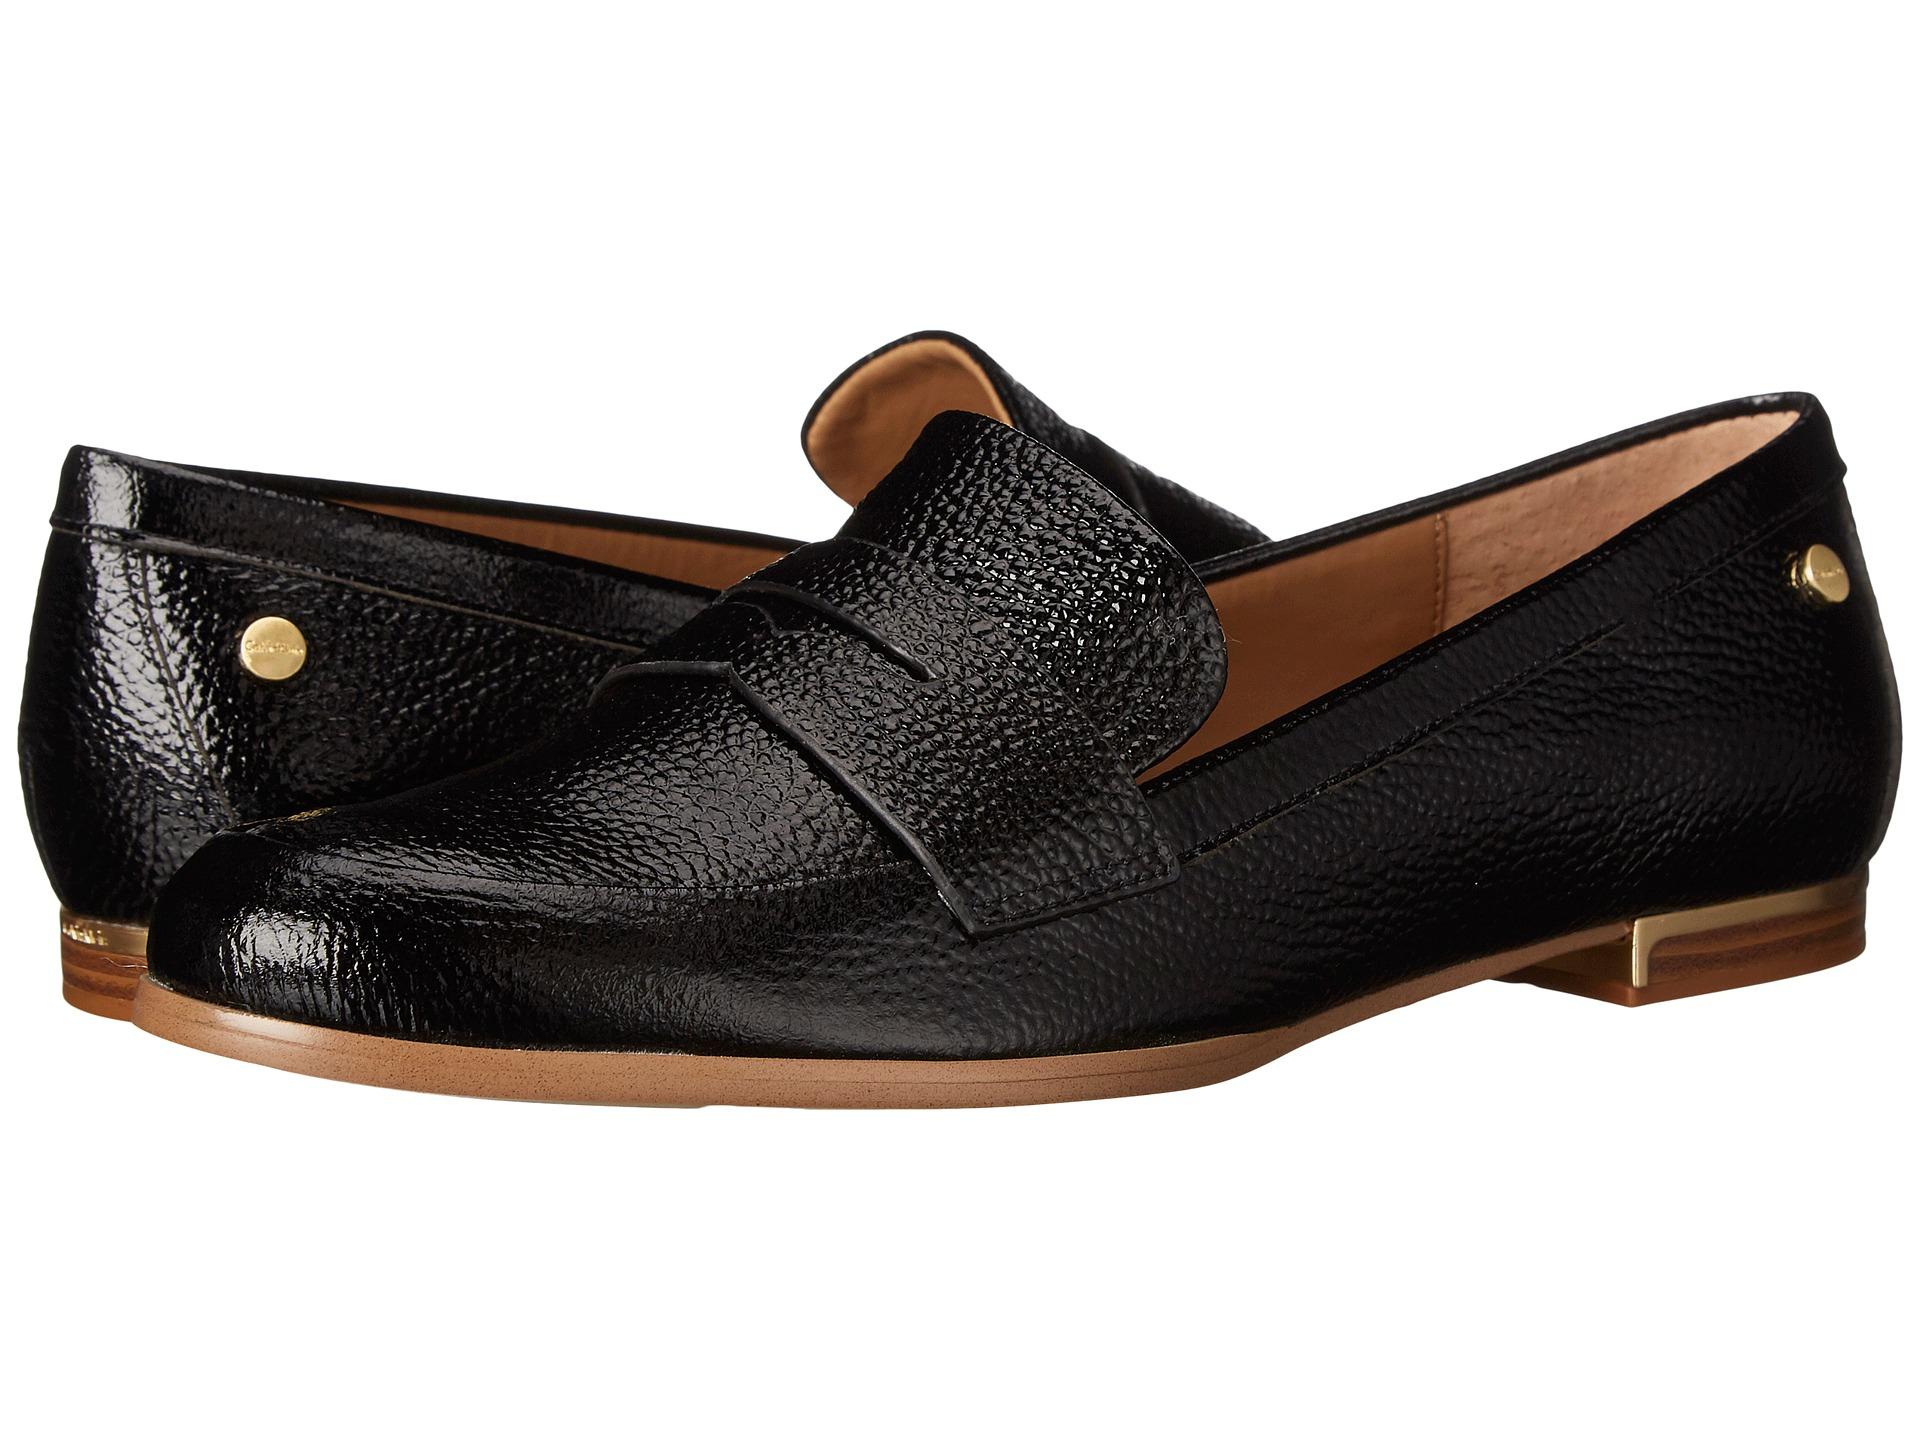 Womens Shoes Calvin Klein Celia Black Tumbled Patent